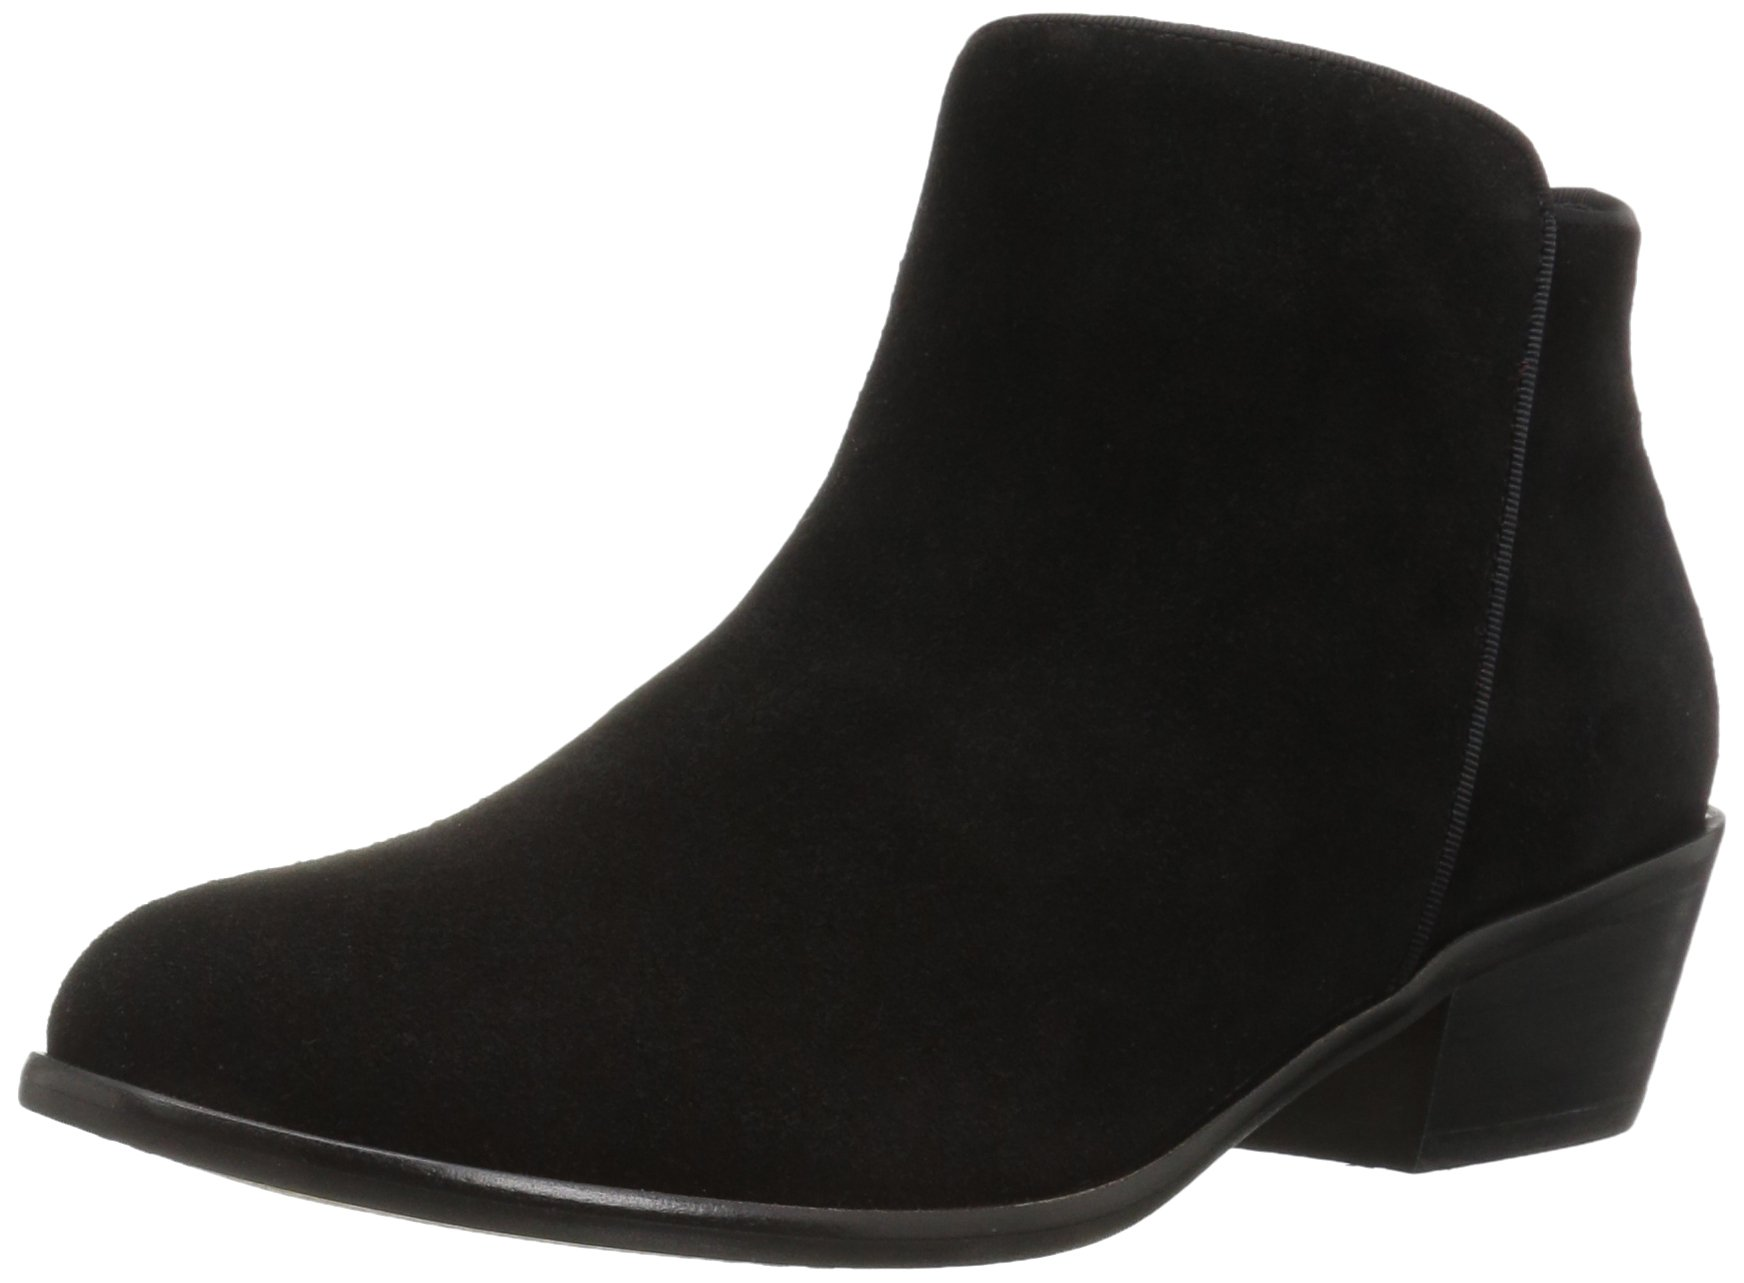 206 Collective Women's Magnolia Low Heel Ankle Bootie, Black, 9 B US